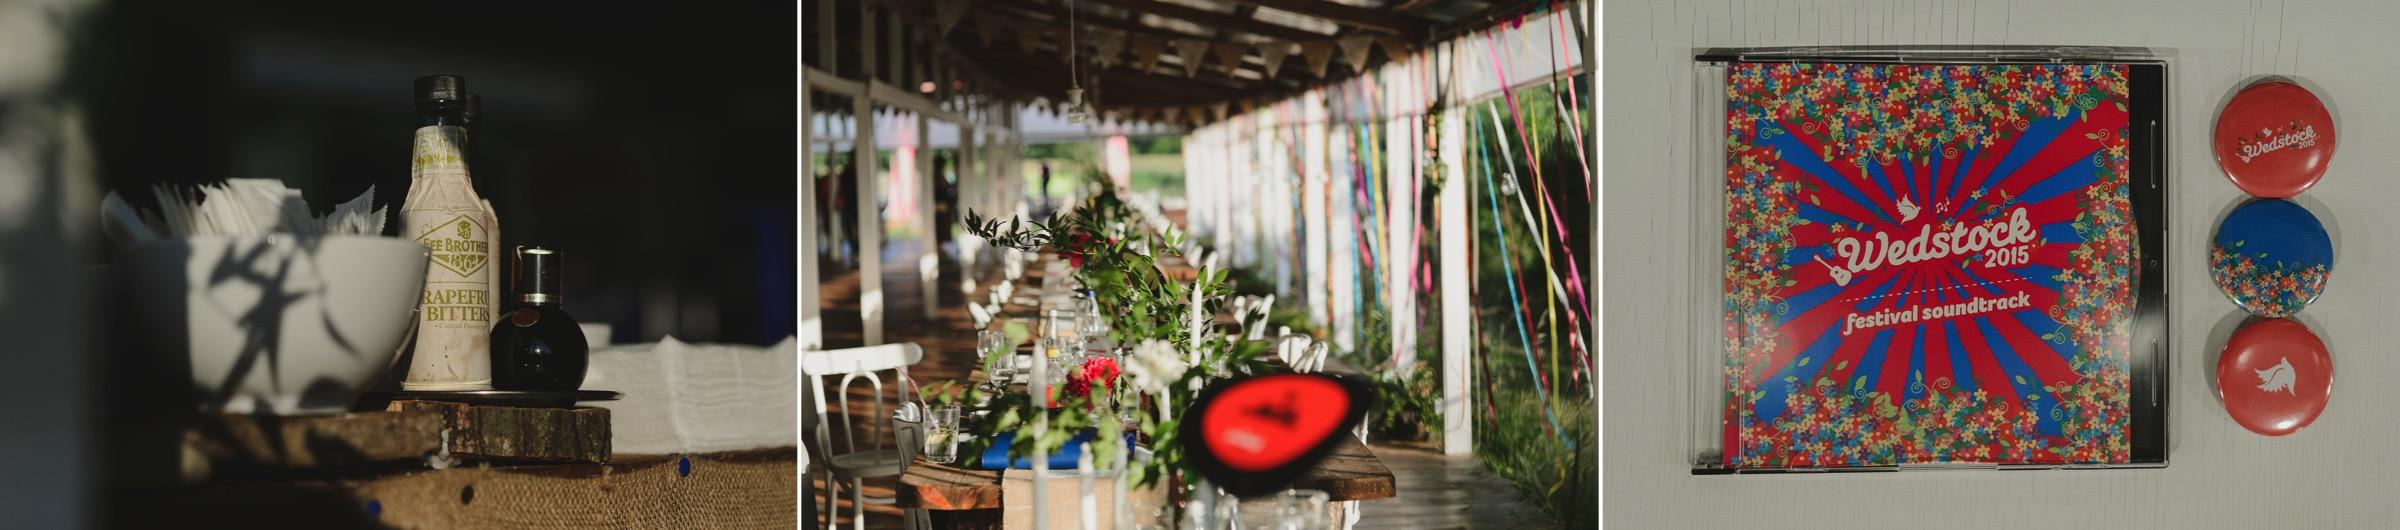 Wedstock Festival Wedding Details Romania